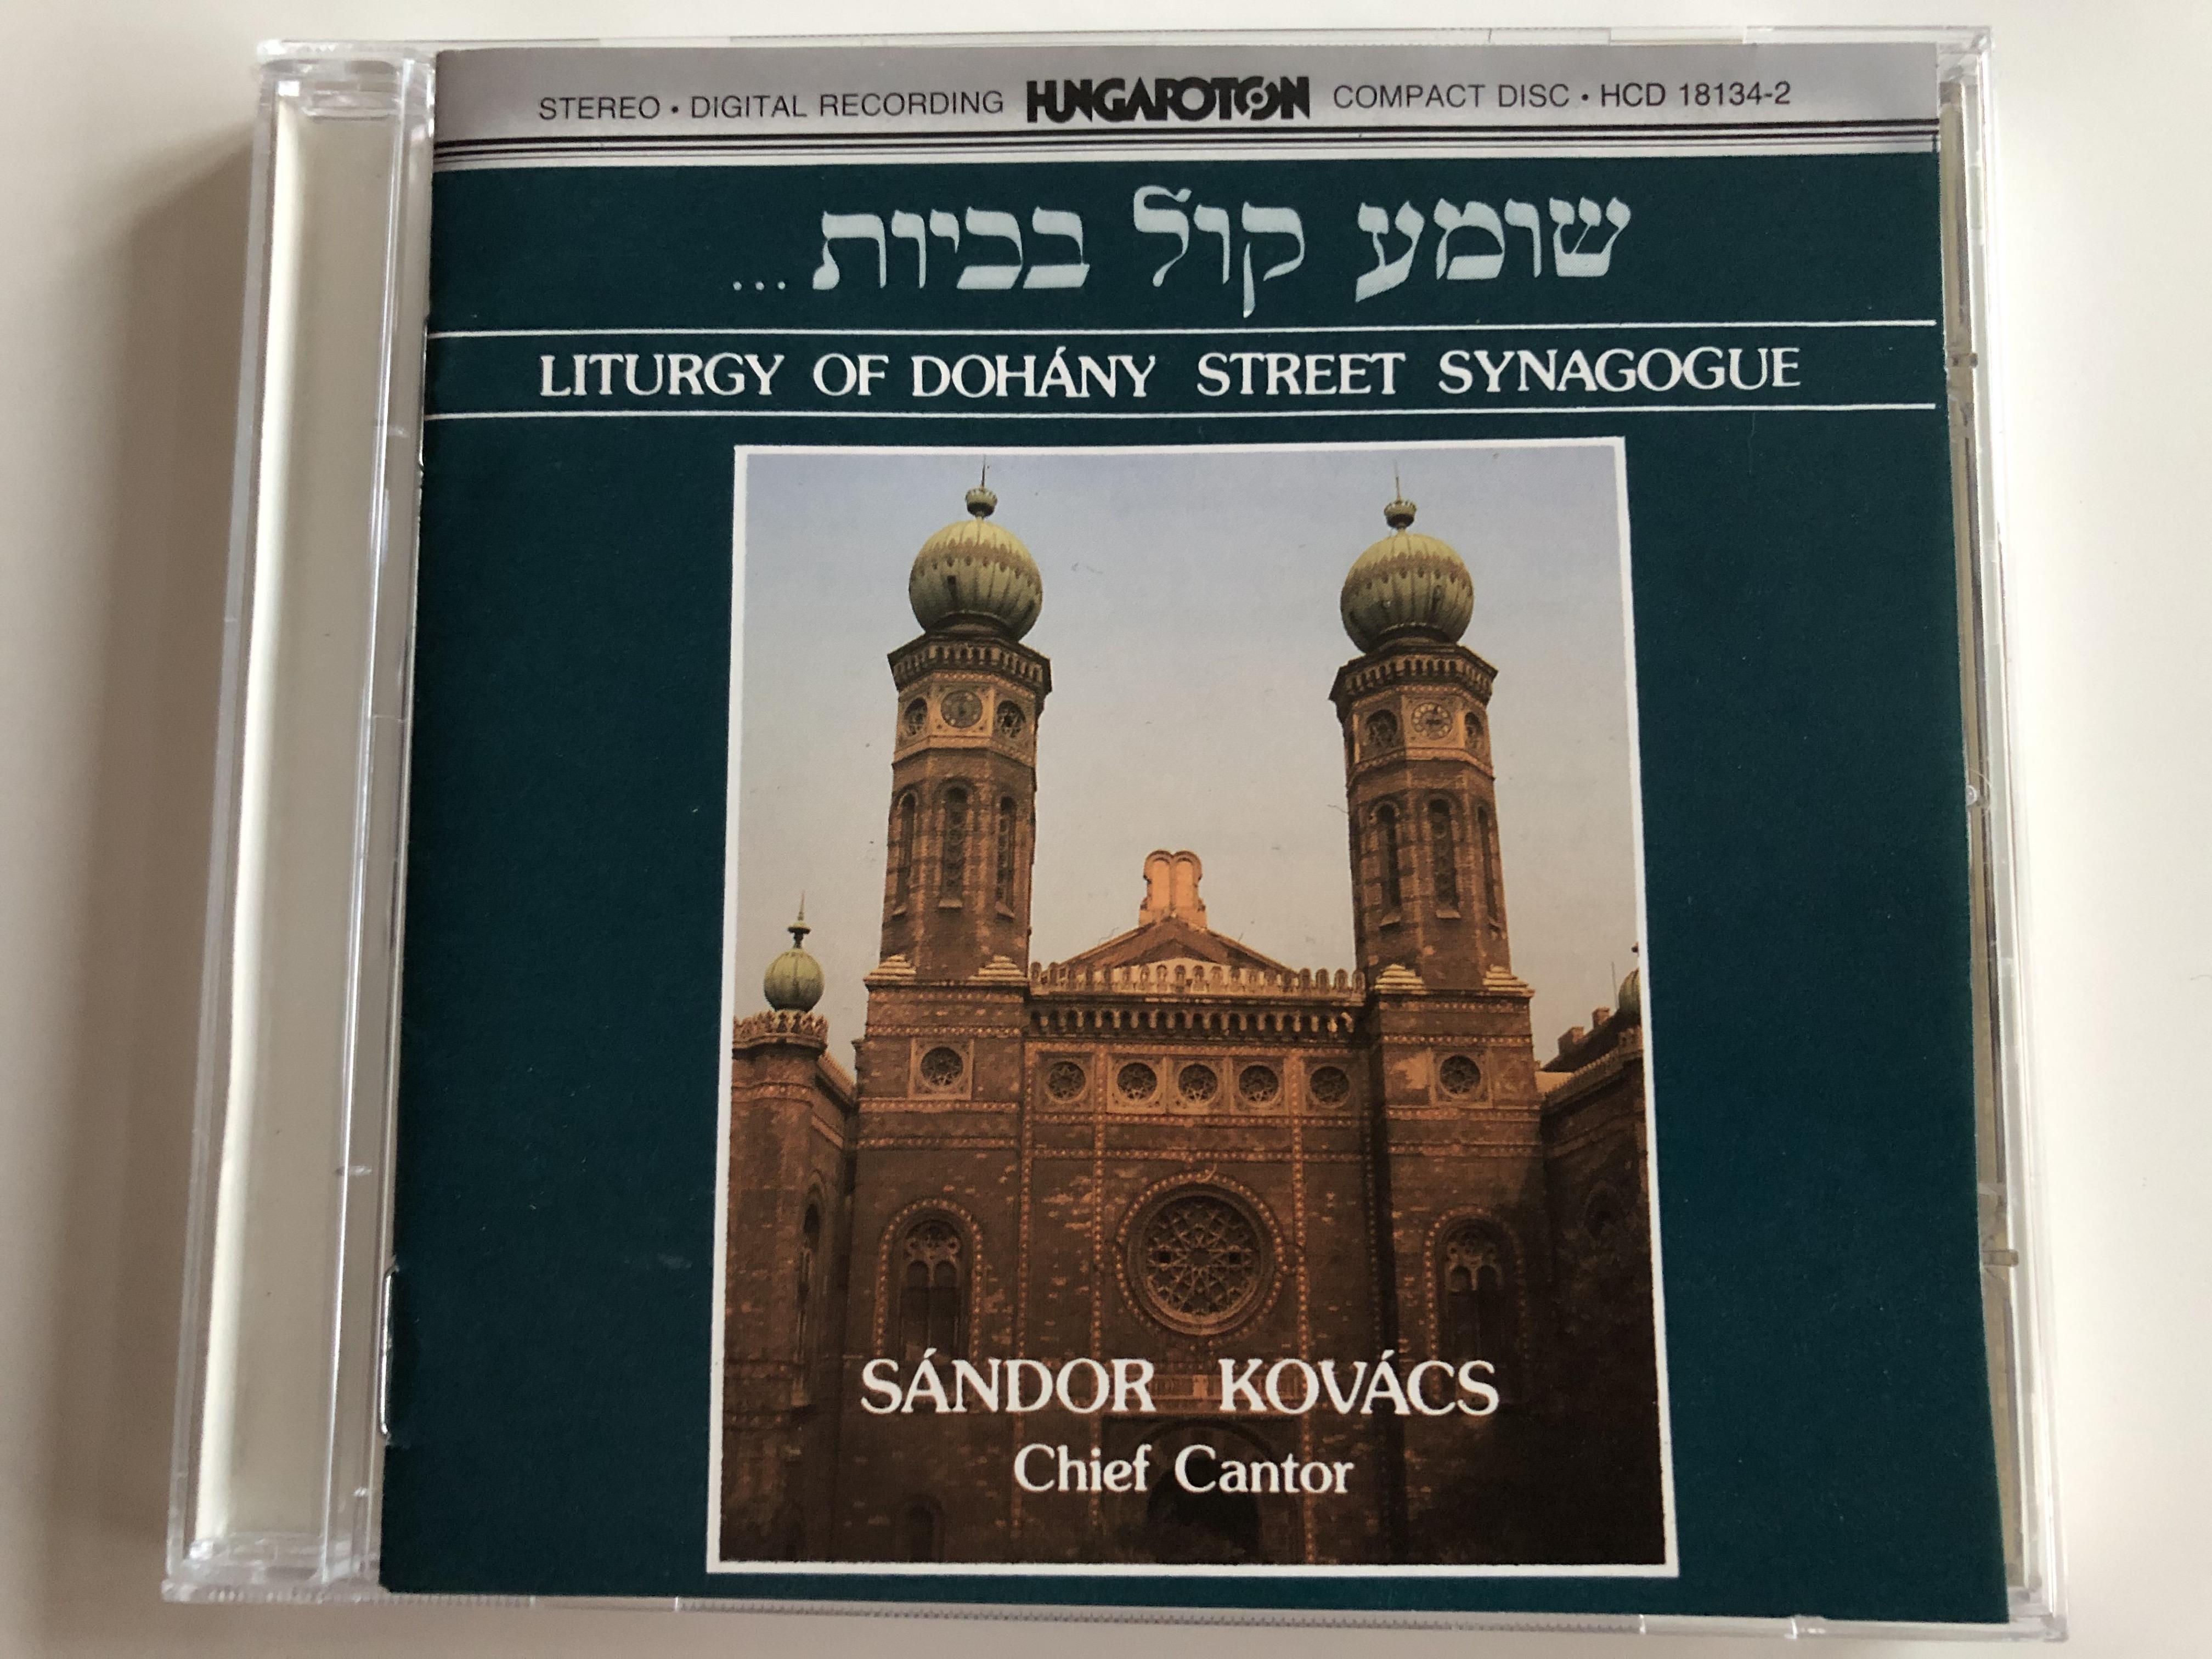 liturgy-of-doh-ny-street-synagogue-s-ndor-kov-cs-chief-cantor-hungaroton-audio-cd-1986-stereo-hcd-18134-2-1-.jpg